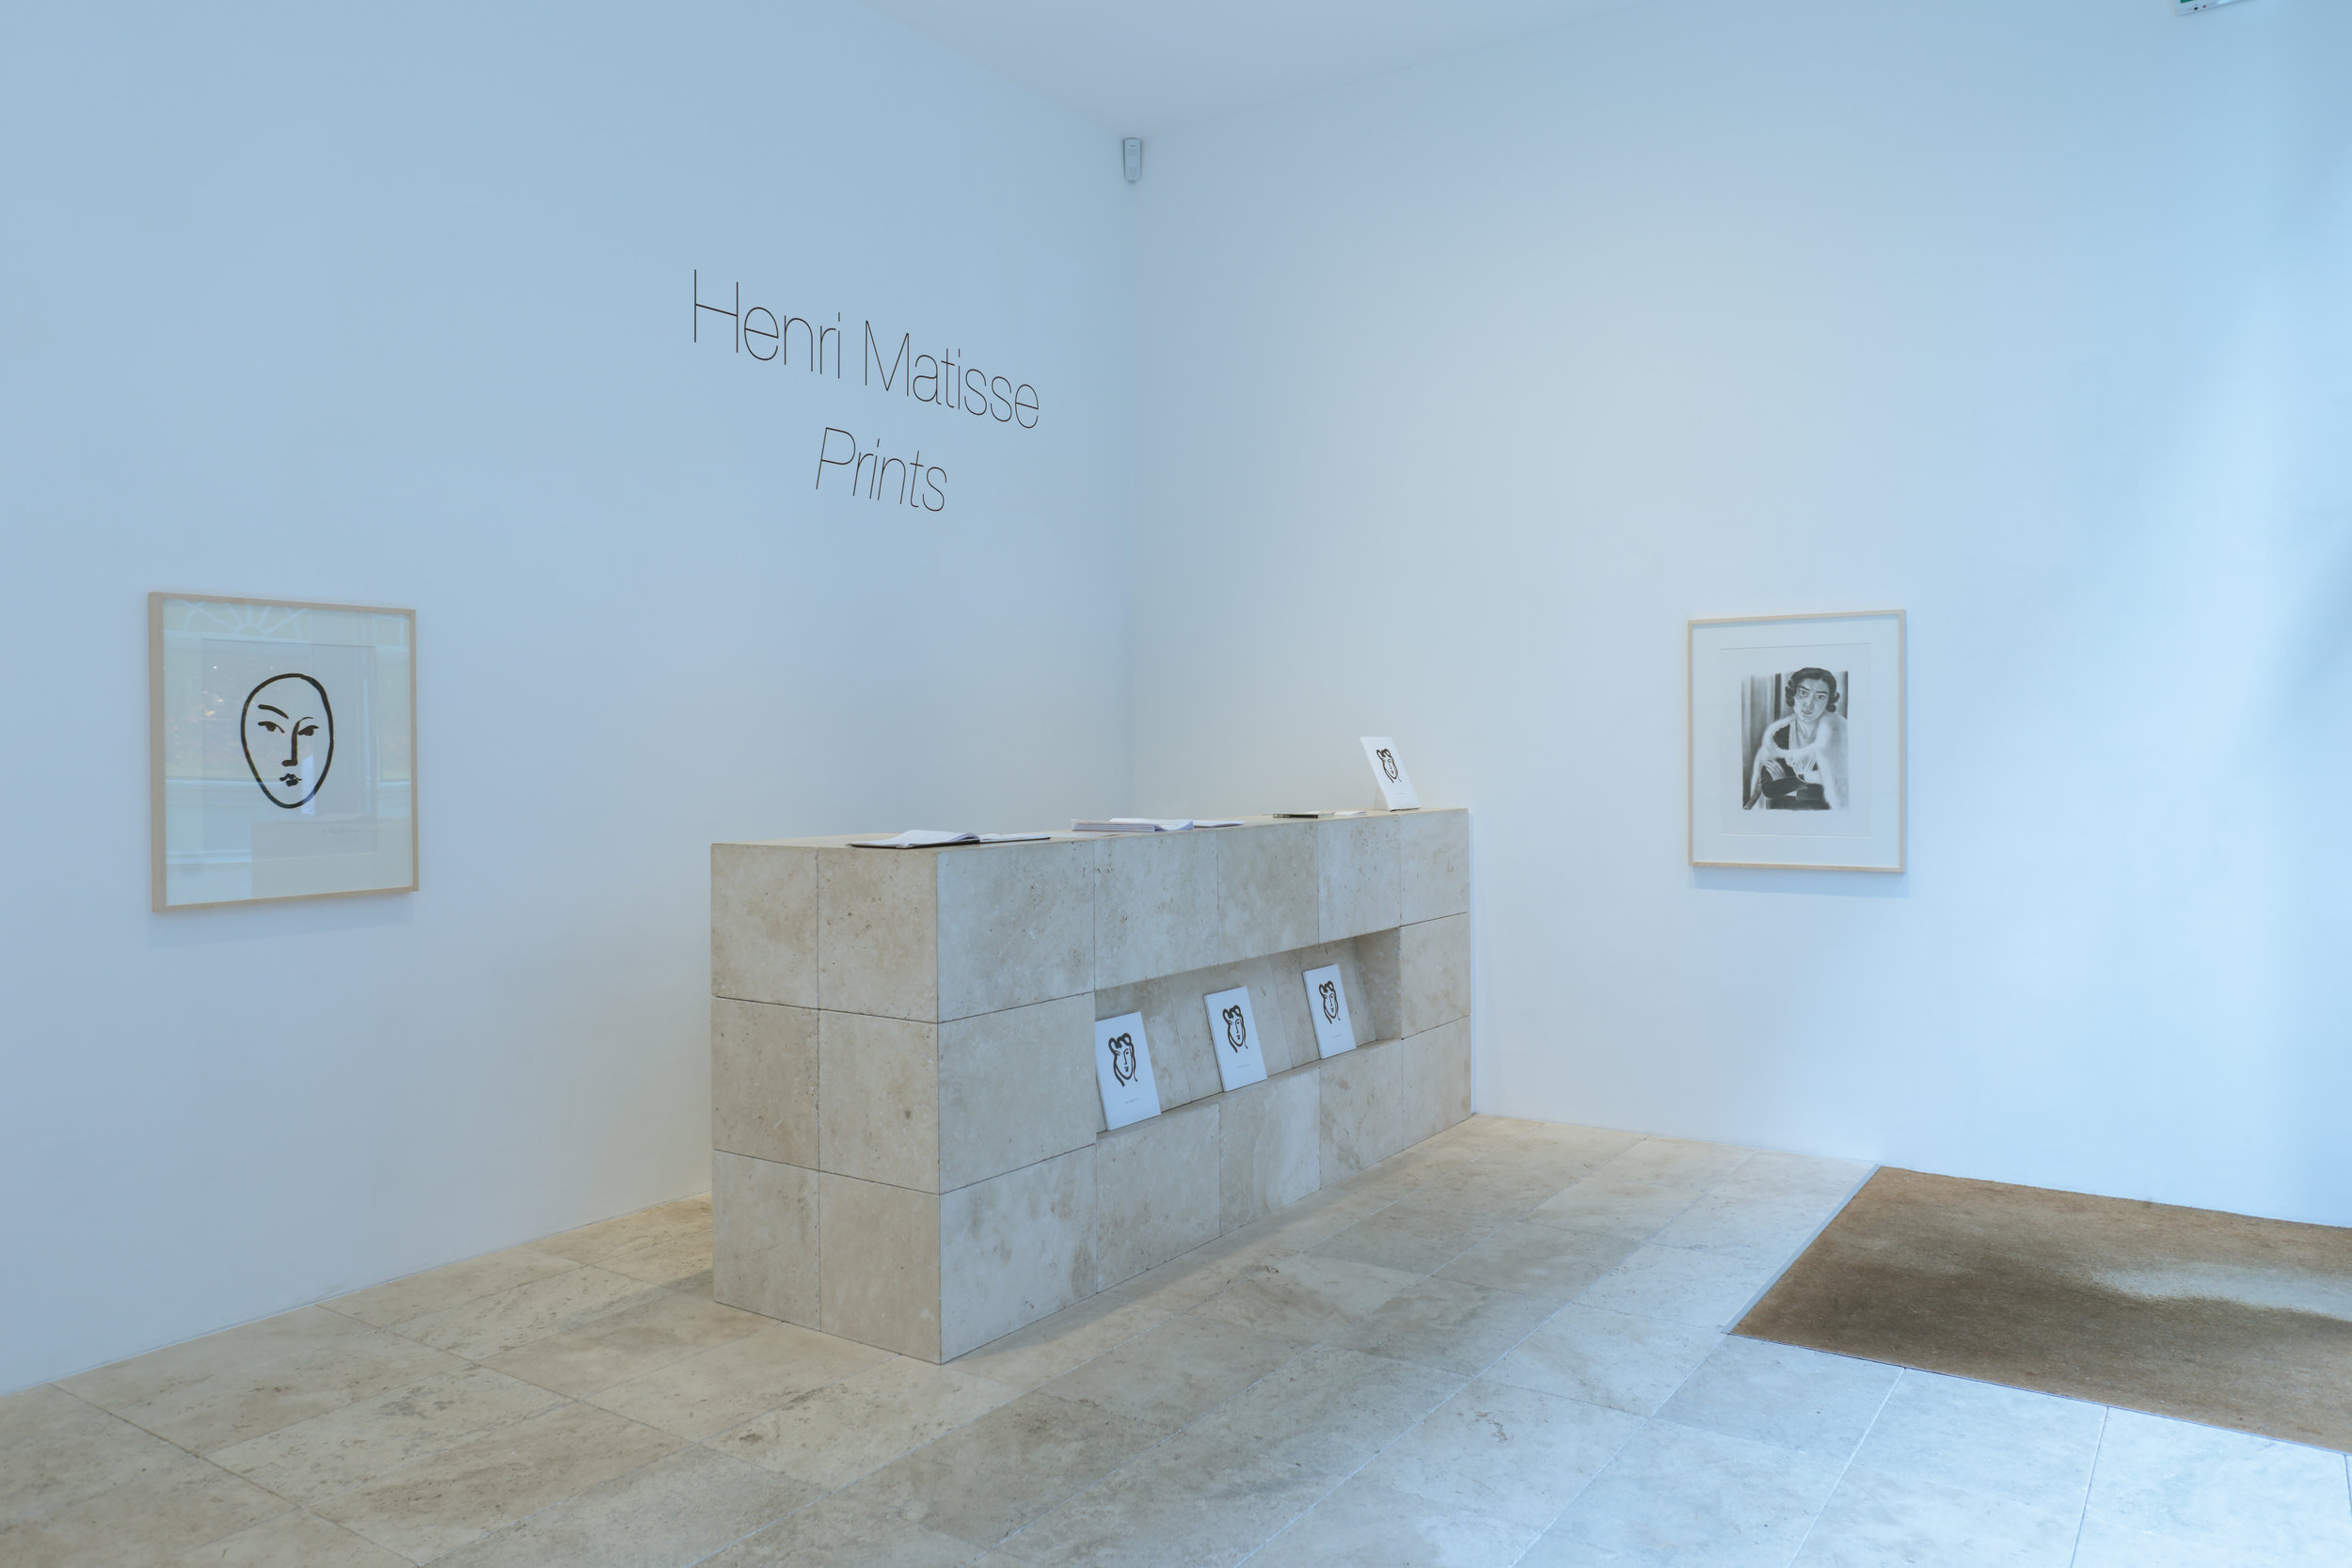 Matisse prints 2018 install 26.jpg